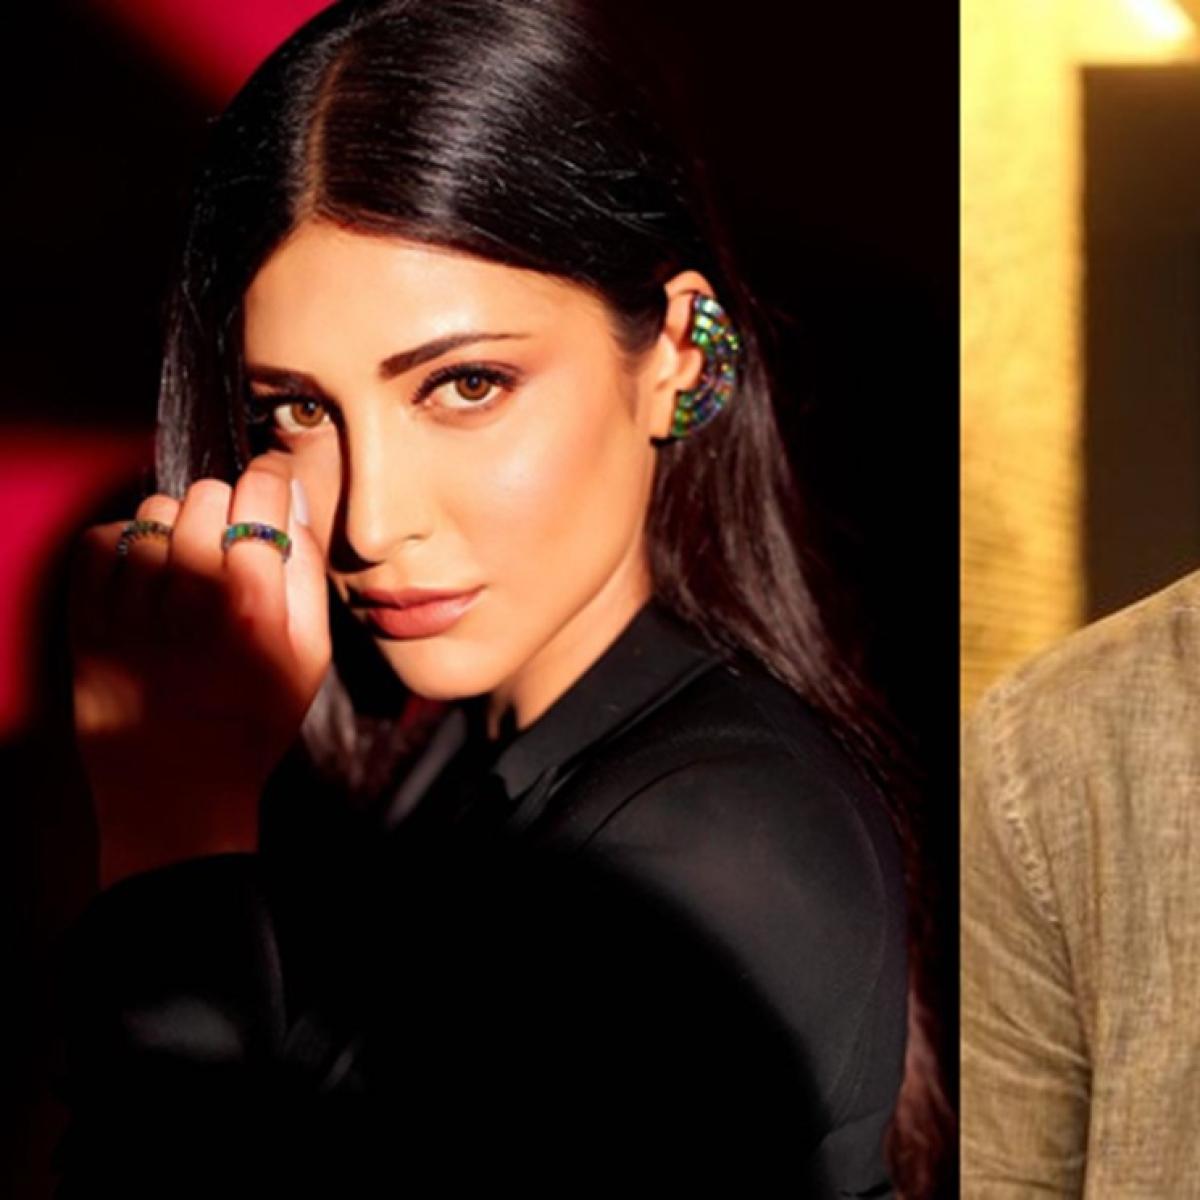 Birthday Special: Shruti Haasan joins Prabhas' action thriller 'Salaar'